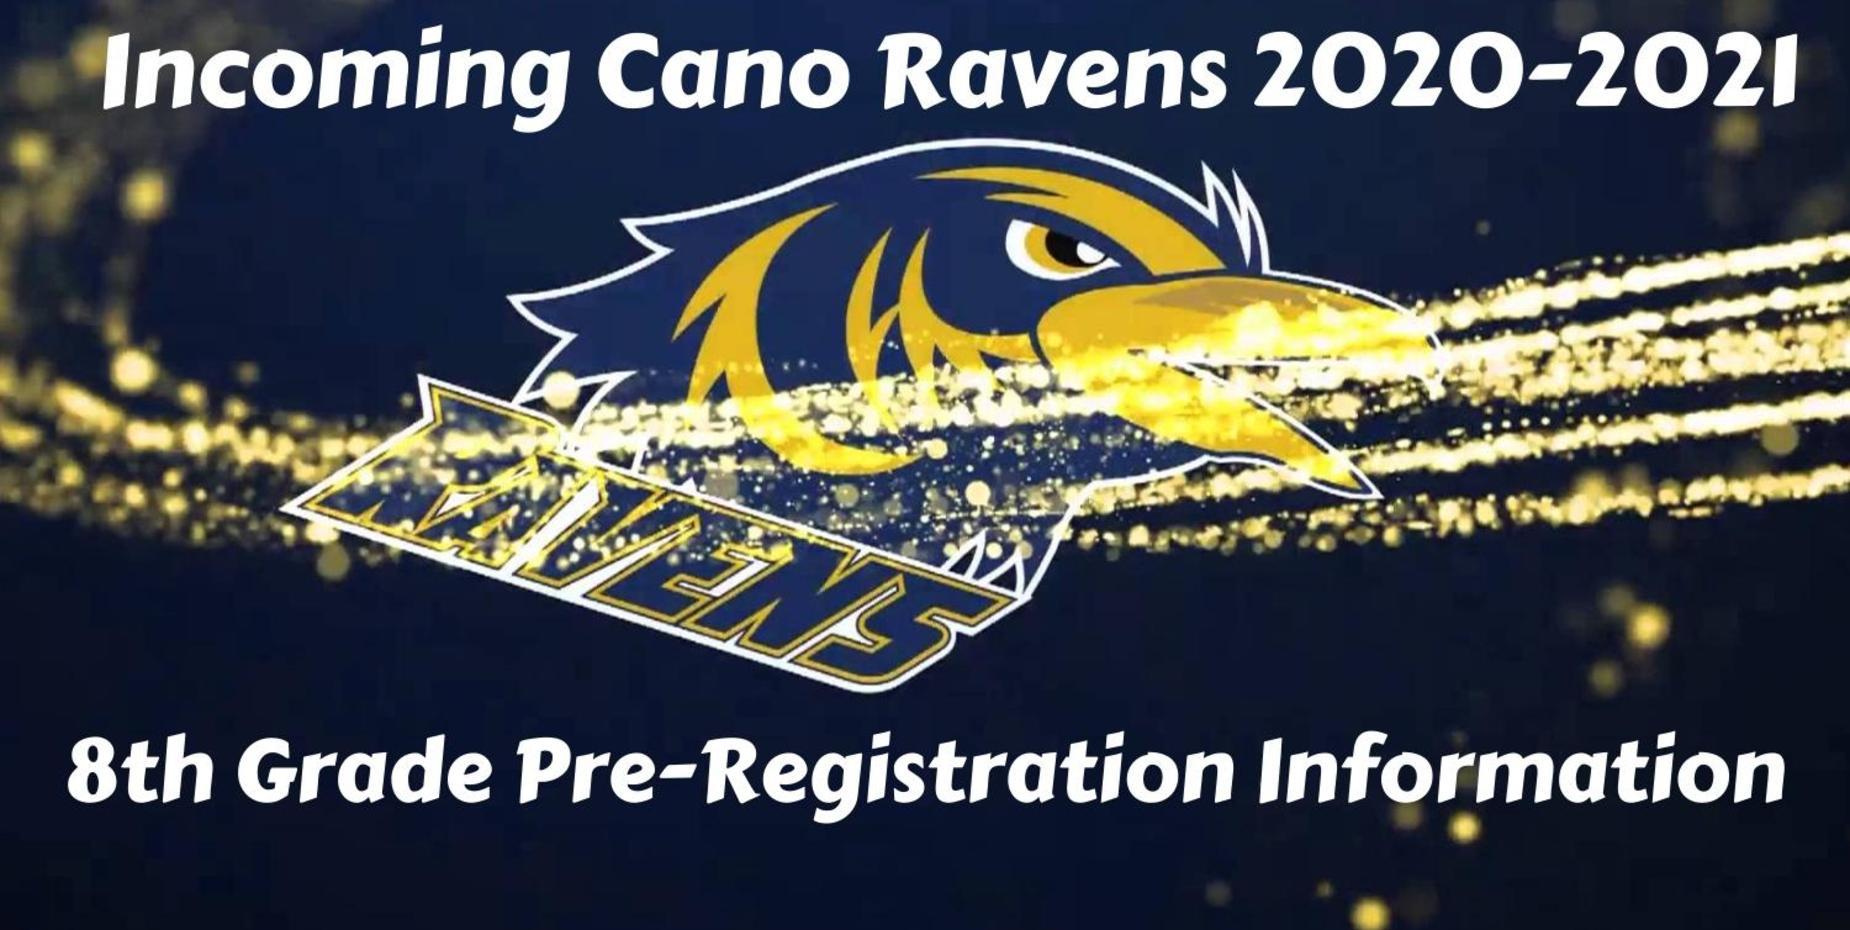 8th Grade Pre-Registration Schedule